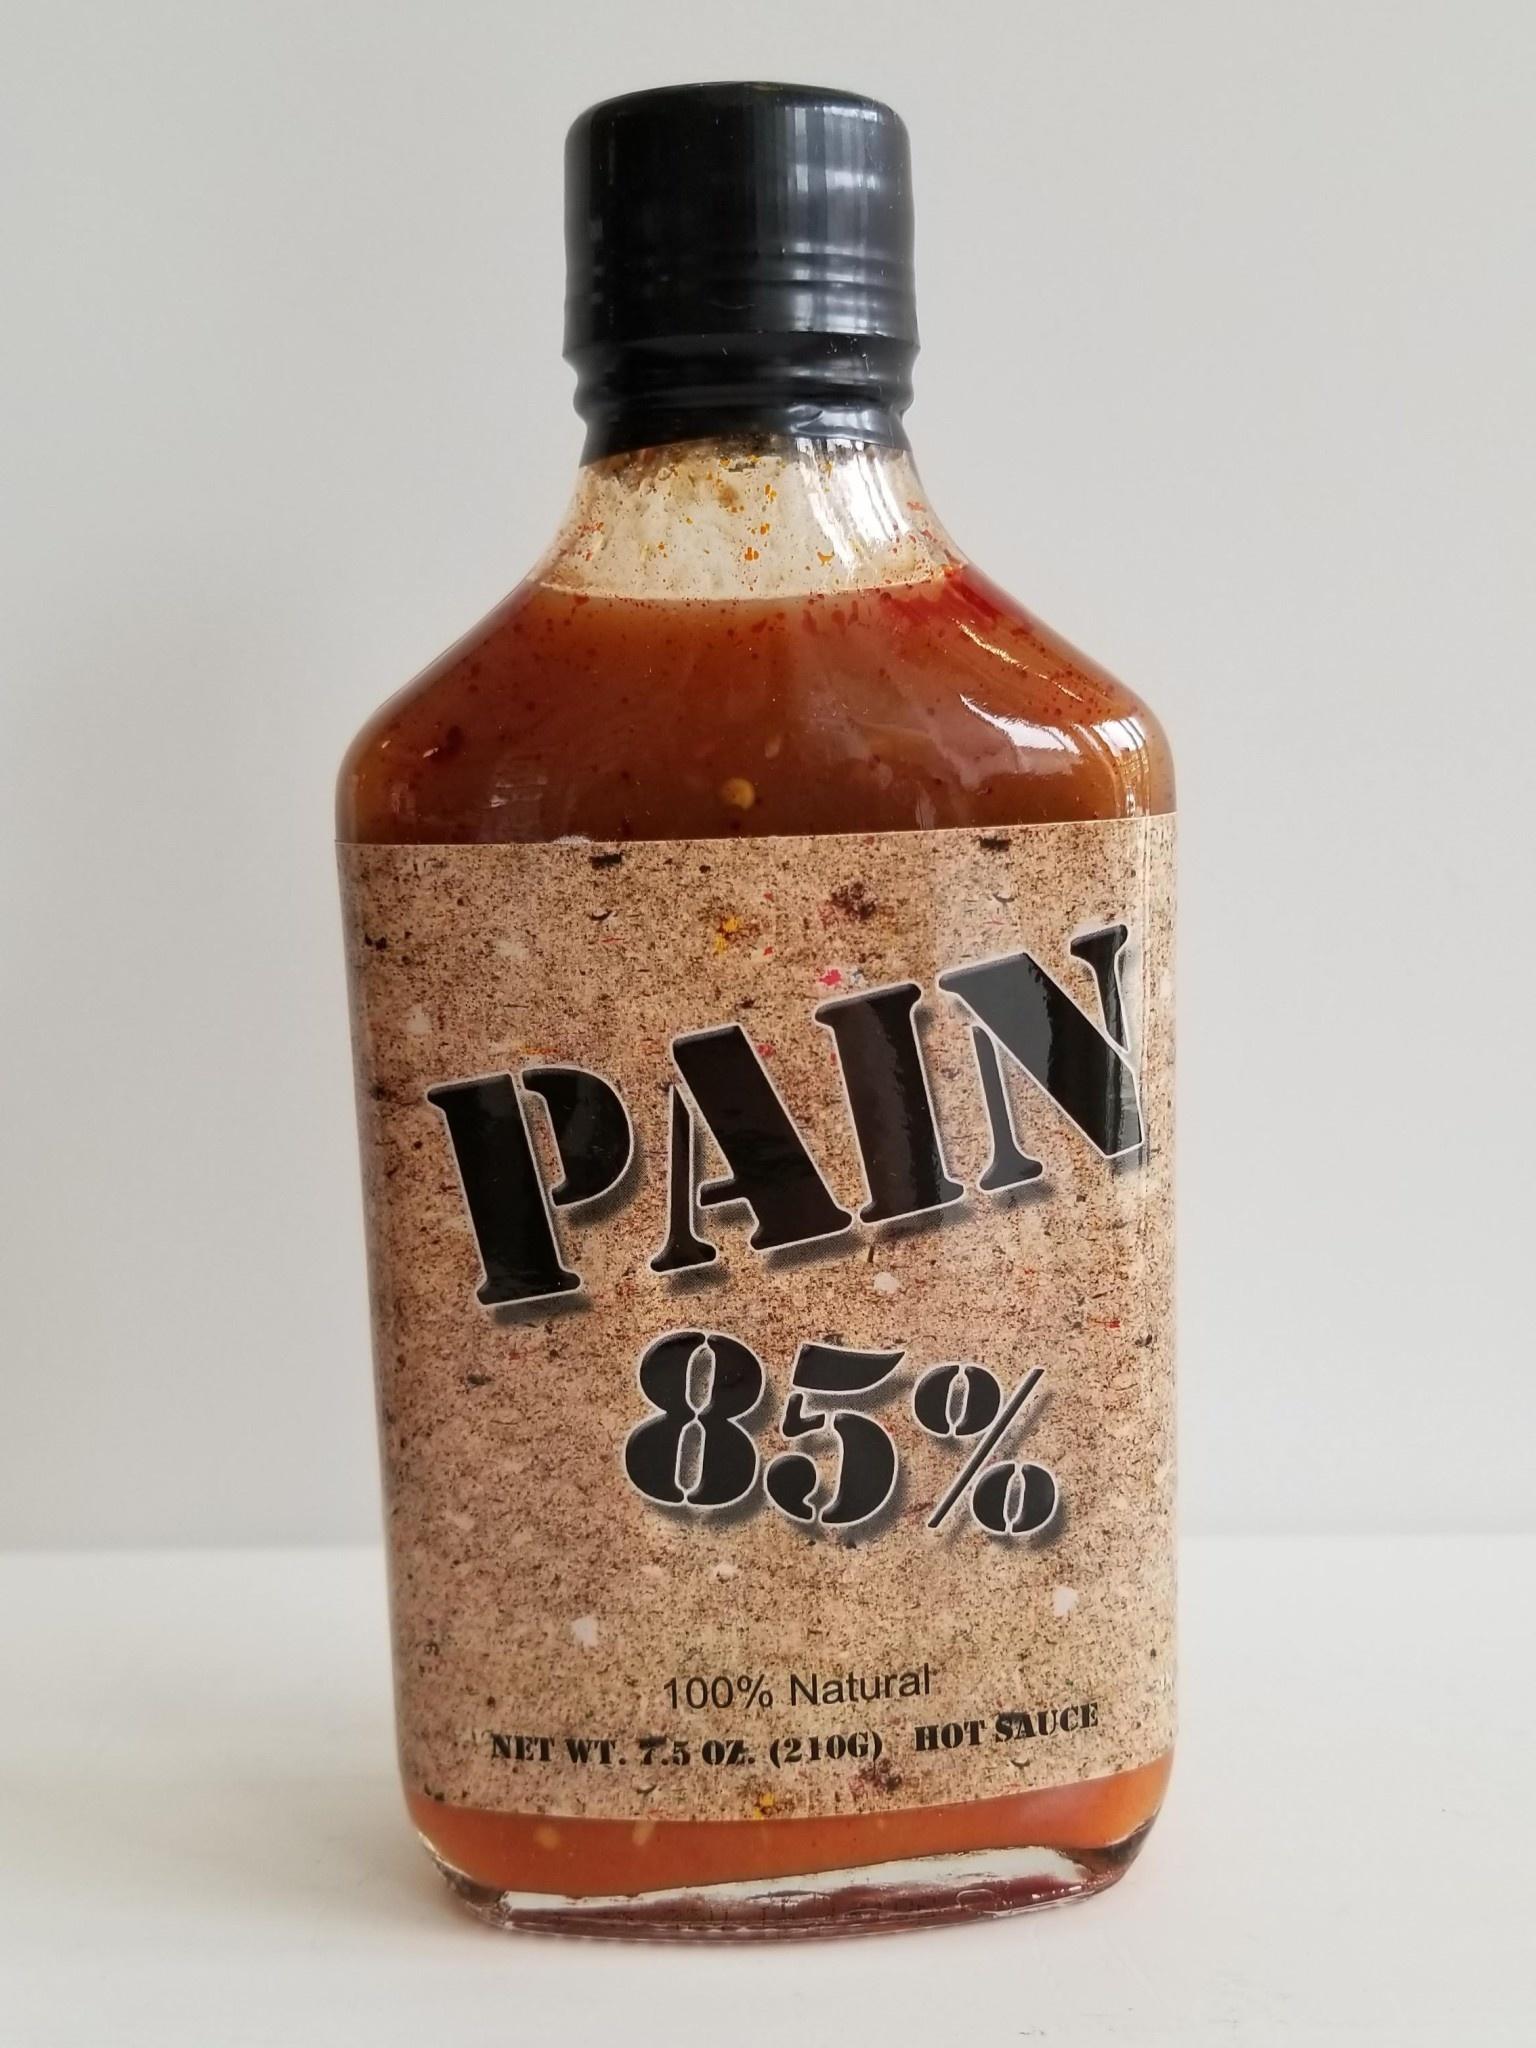 Pain 85%